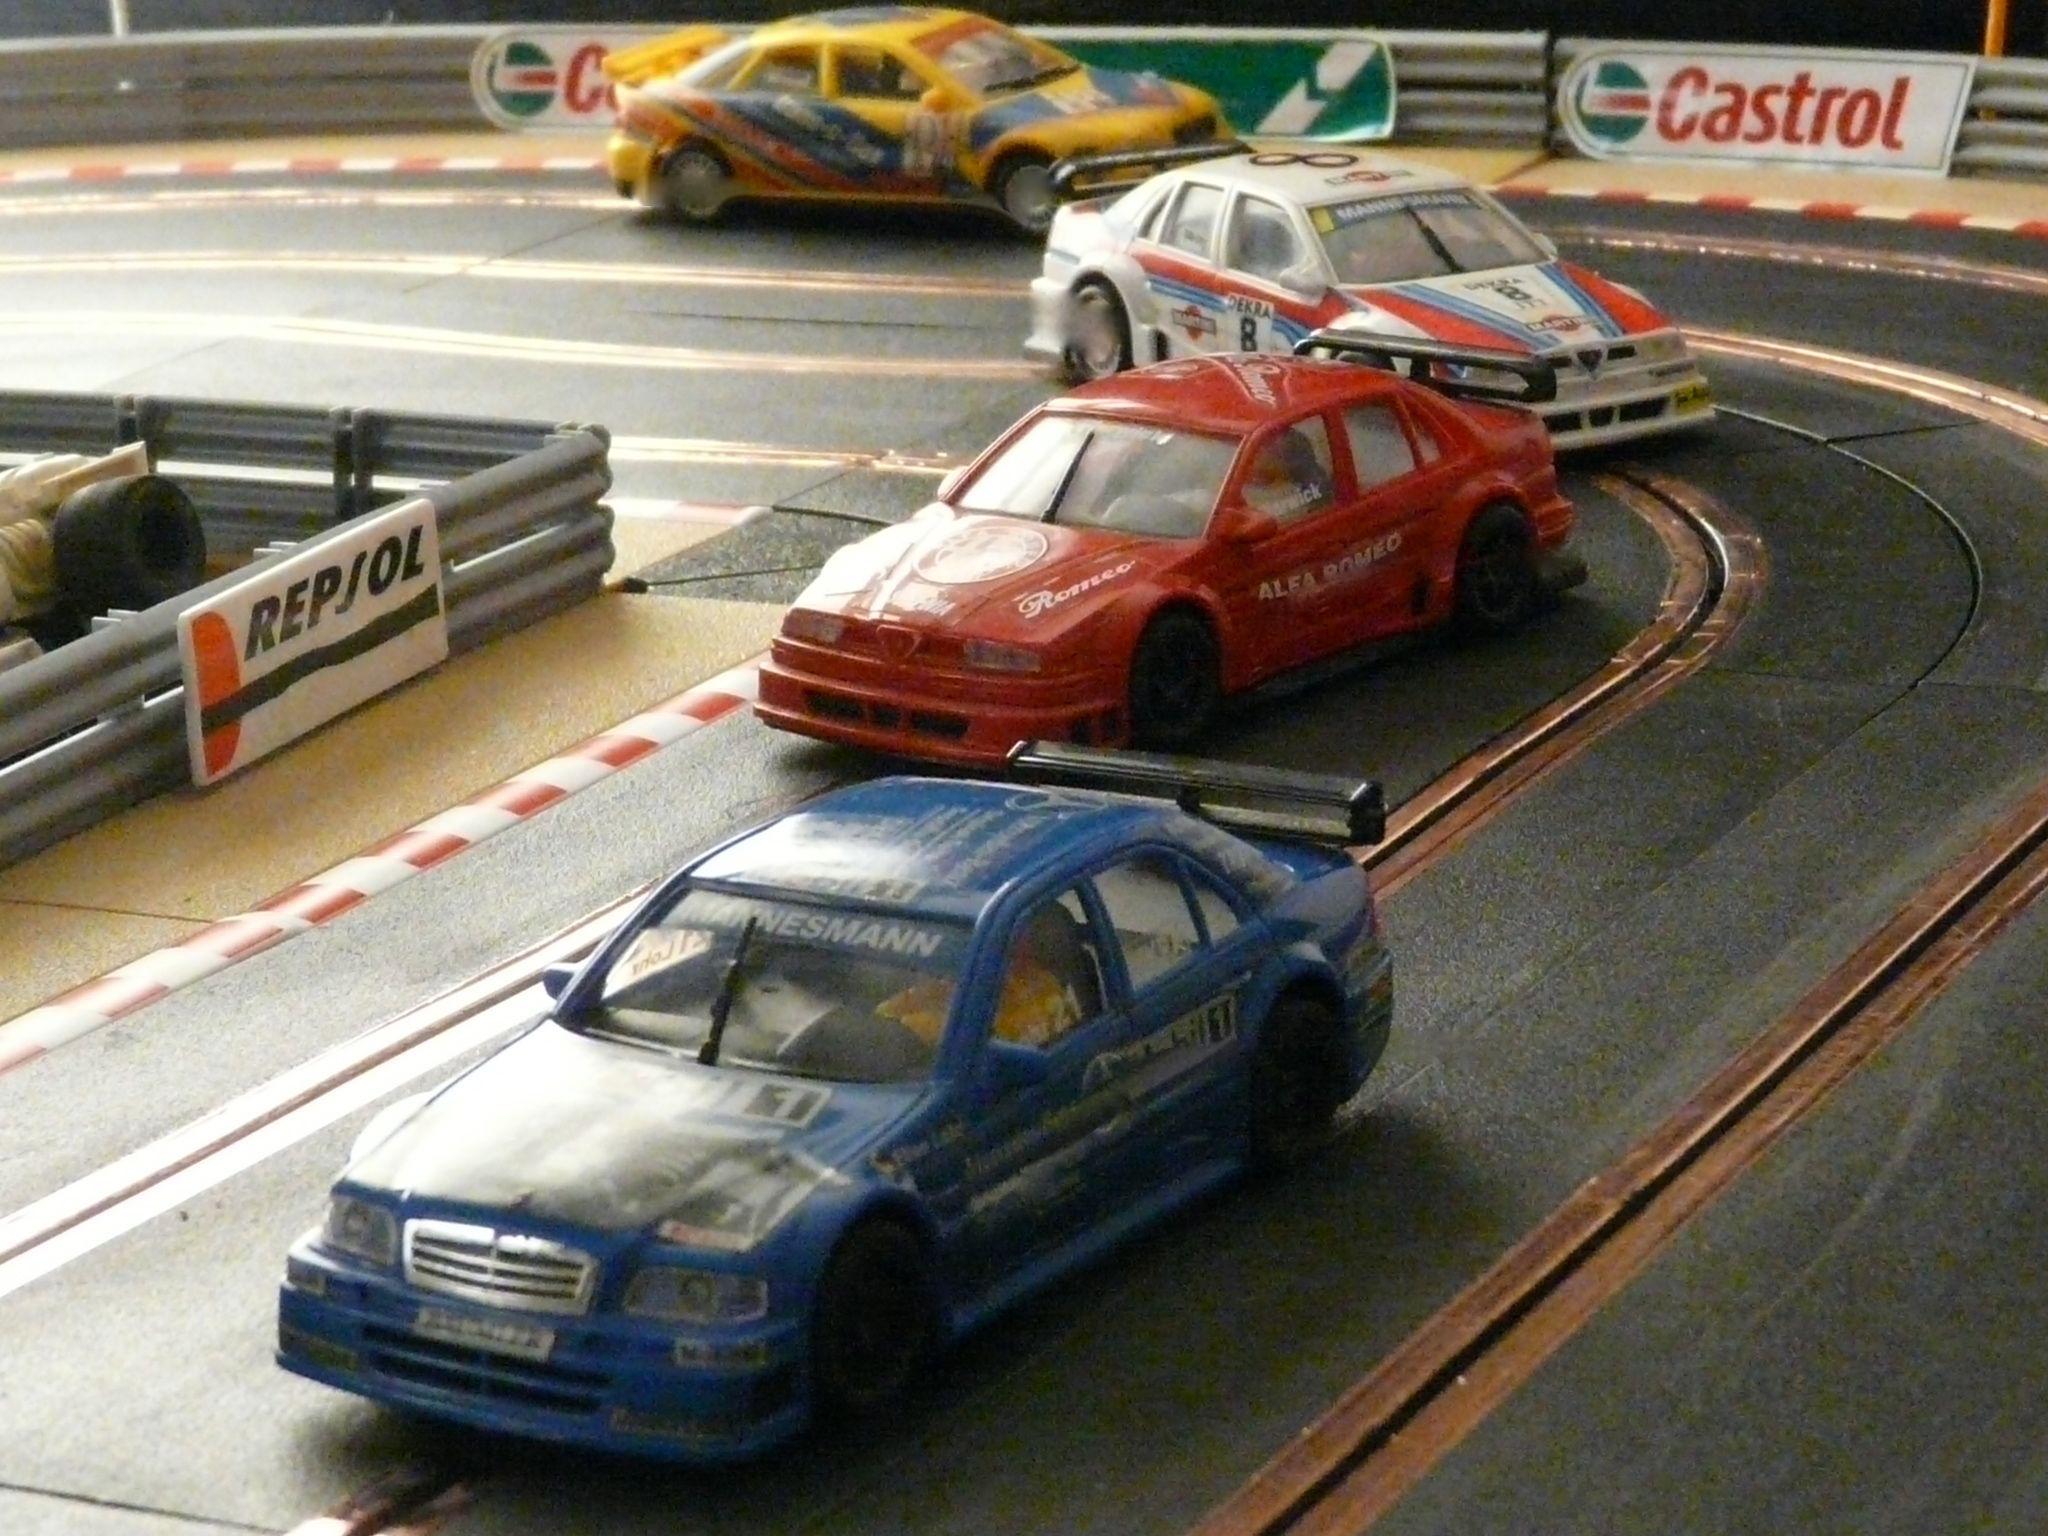 80s car toys  Pin by whiz on slot car tracks  Pinterest  Slot car tracks